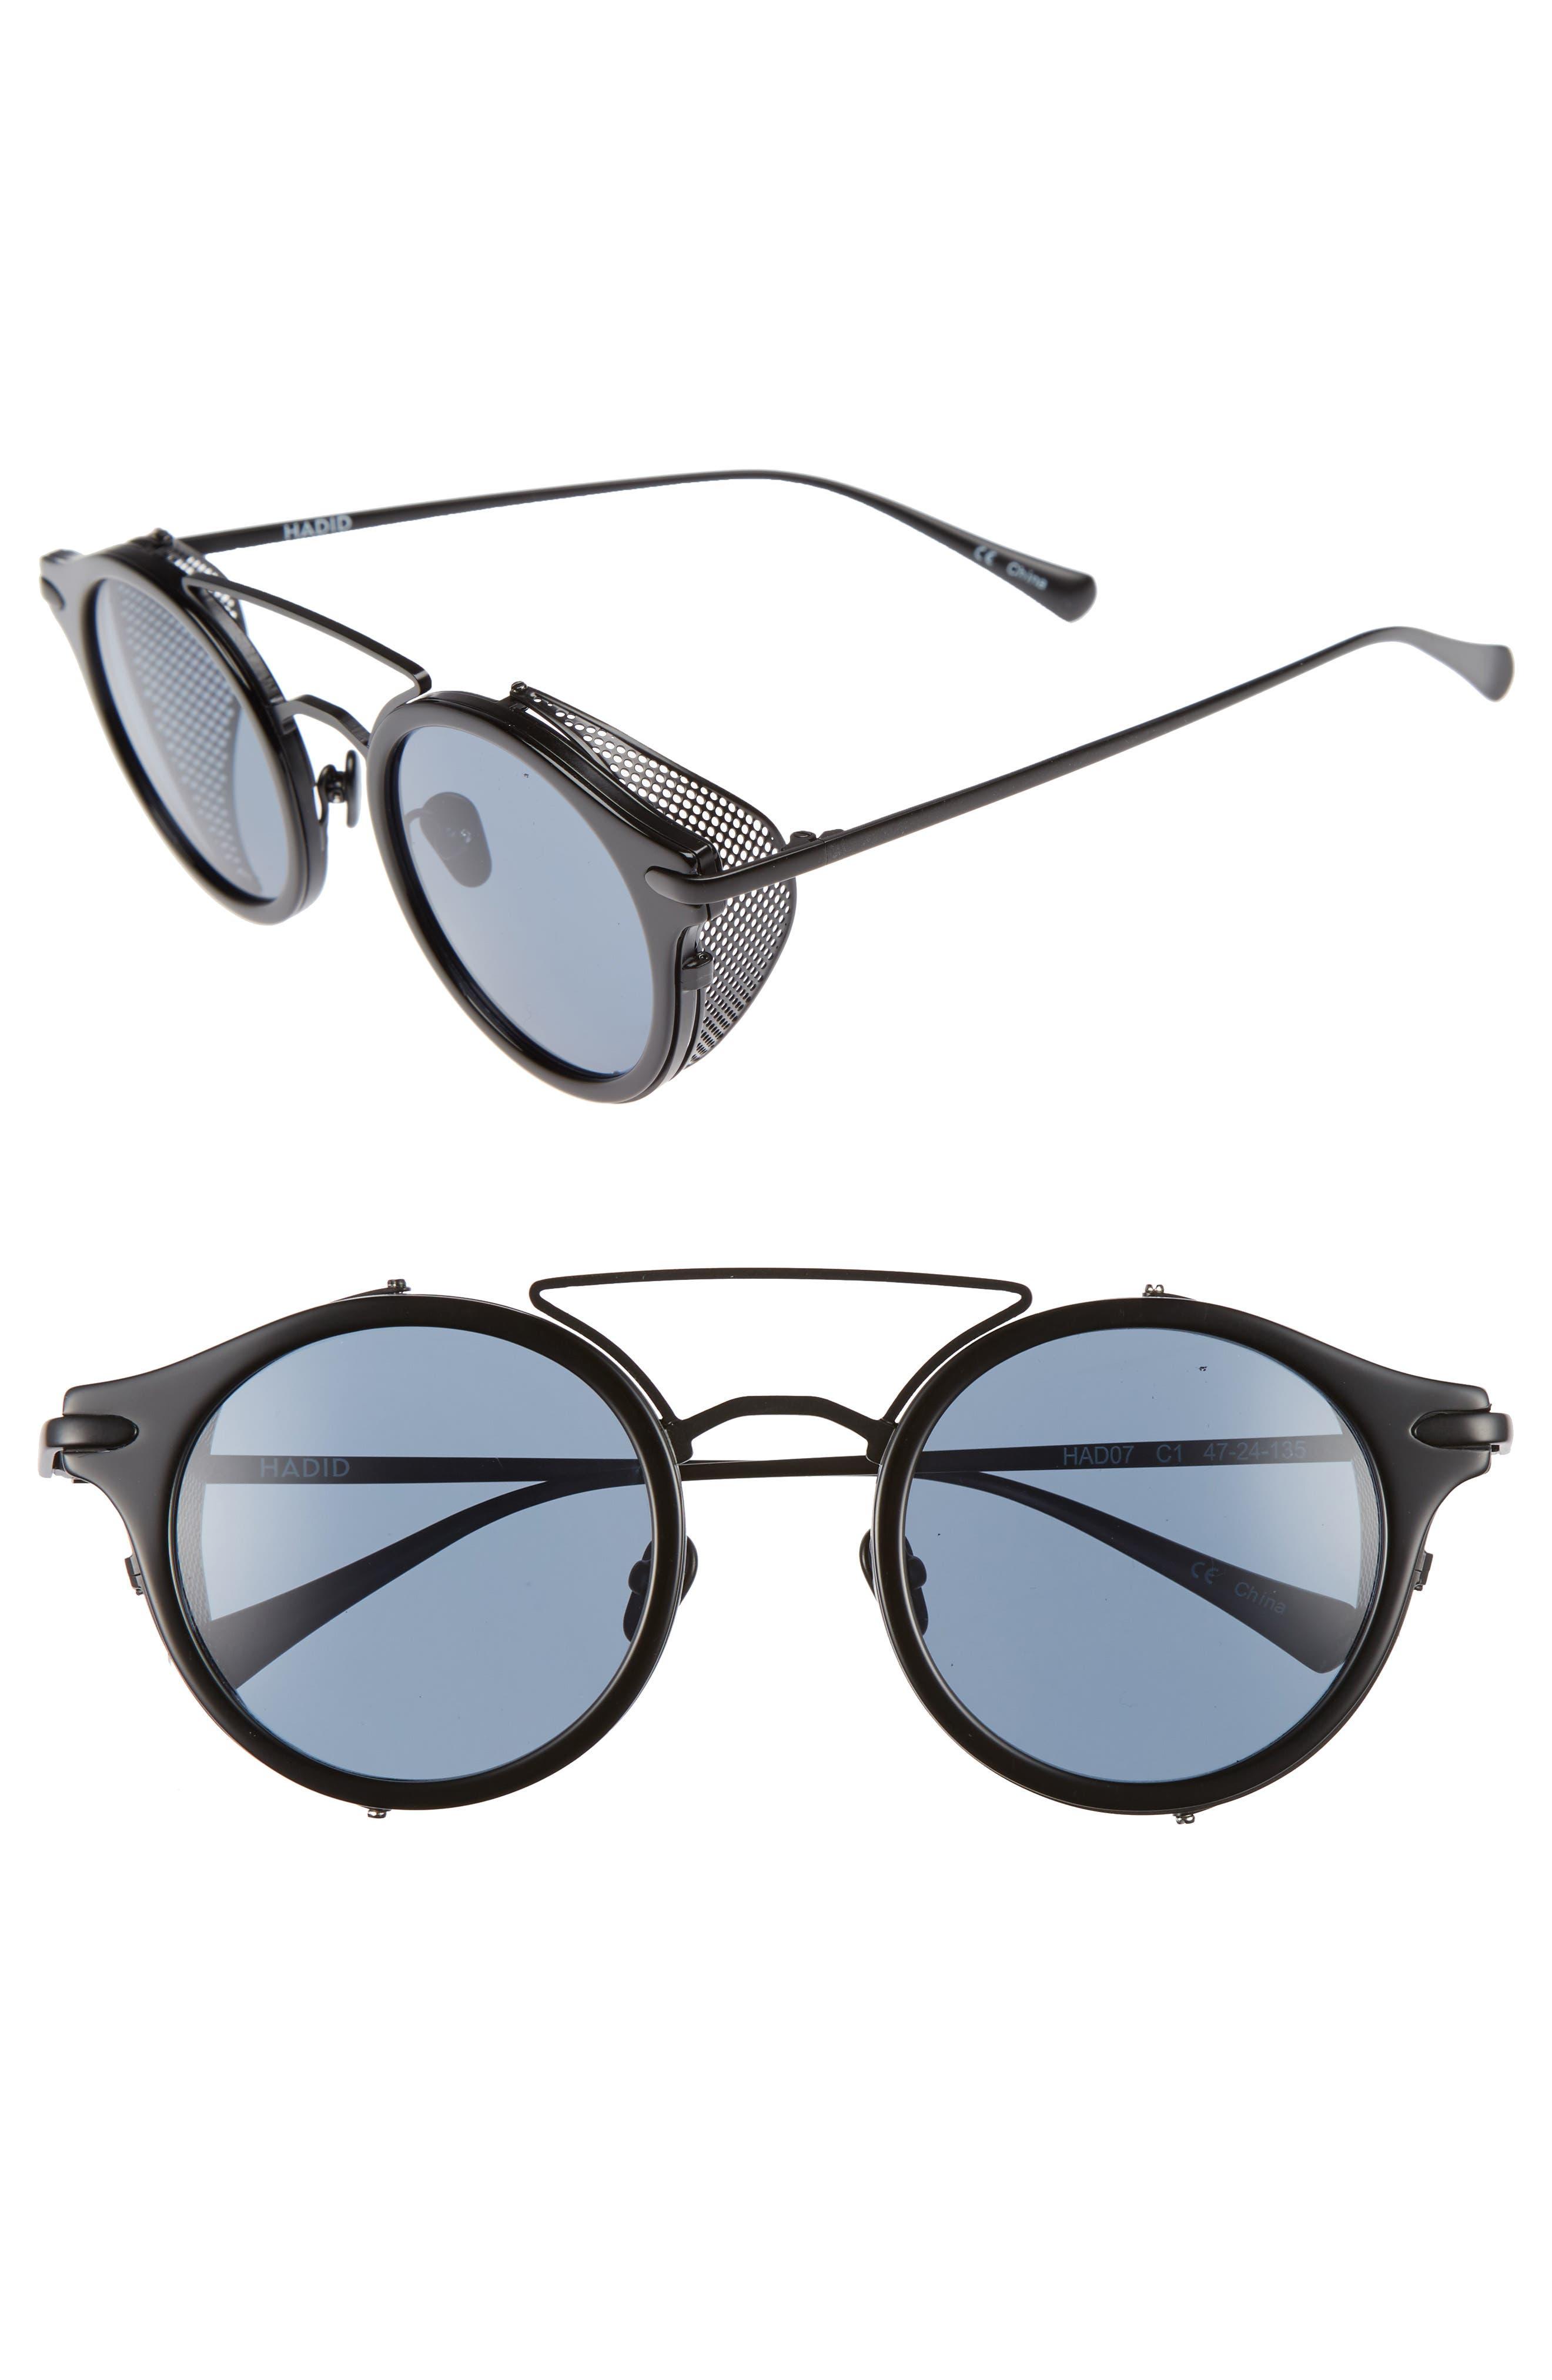 Mile High 47mm Sunglasses,                             Main thumbnail 1, color,                             001